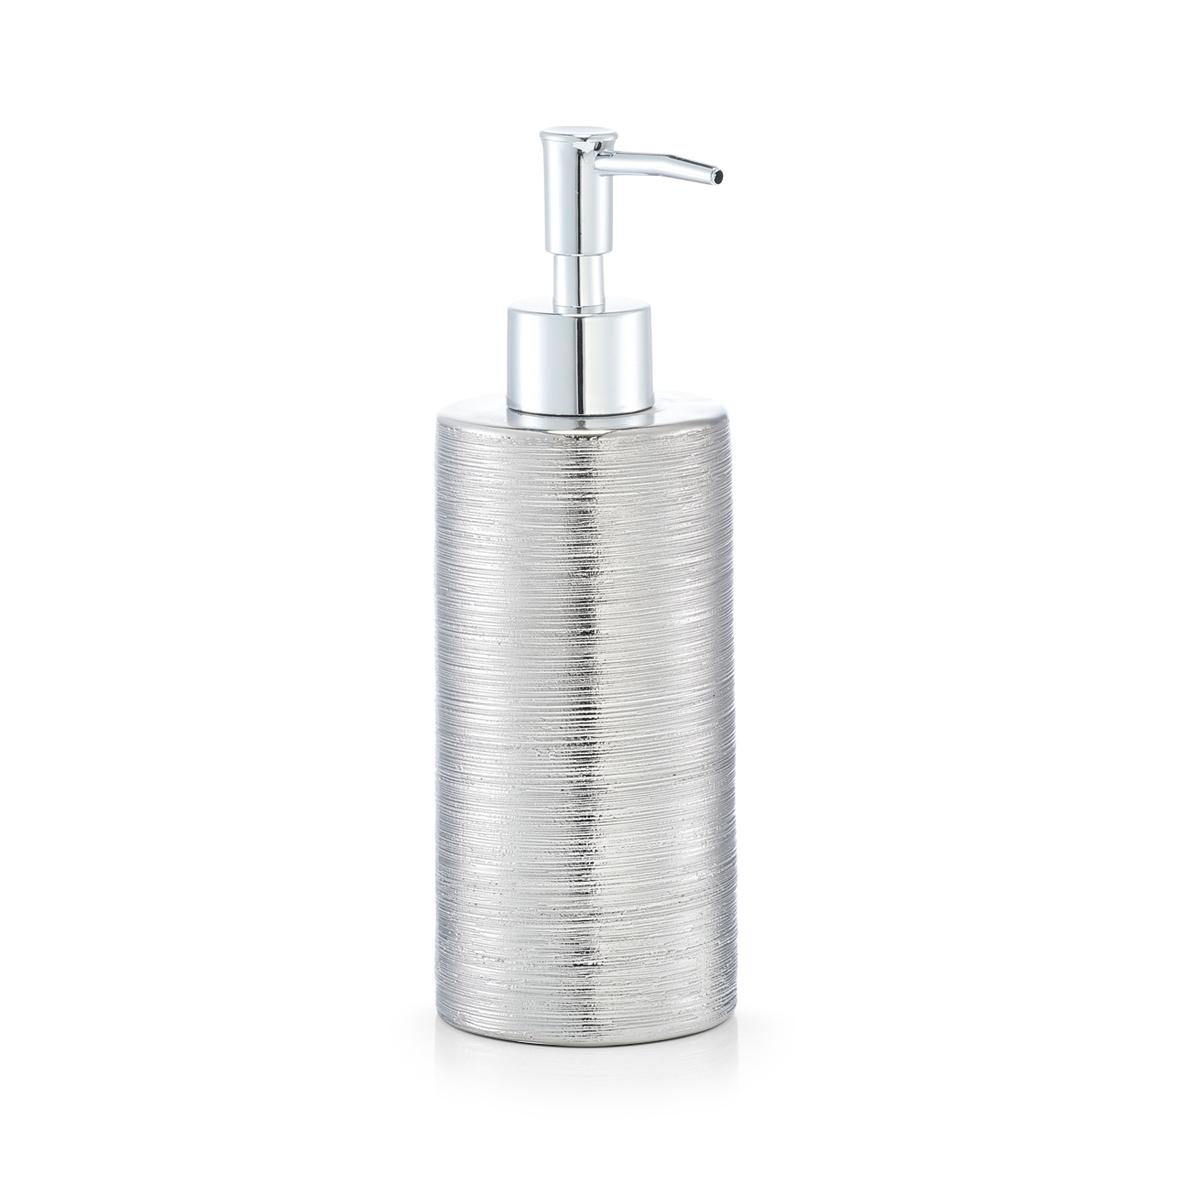 Dozator pentru sapun din ceramica, Brushed Silver, Ø 6,7xH19,5 cm